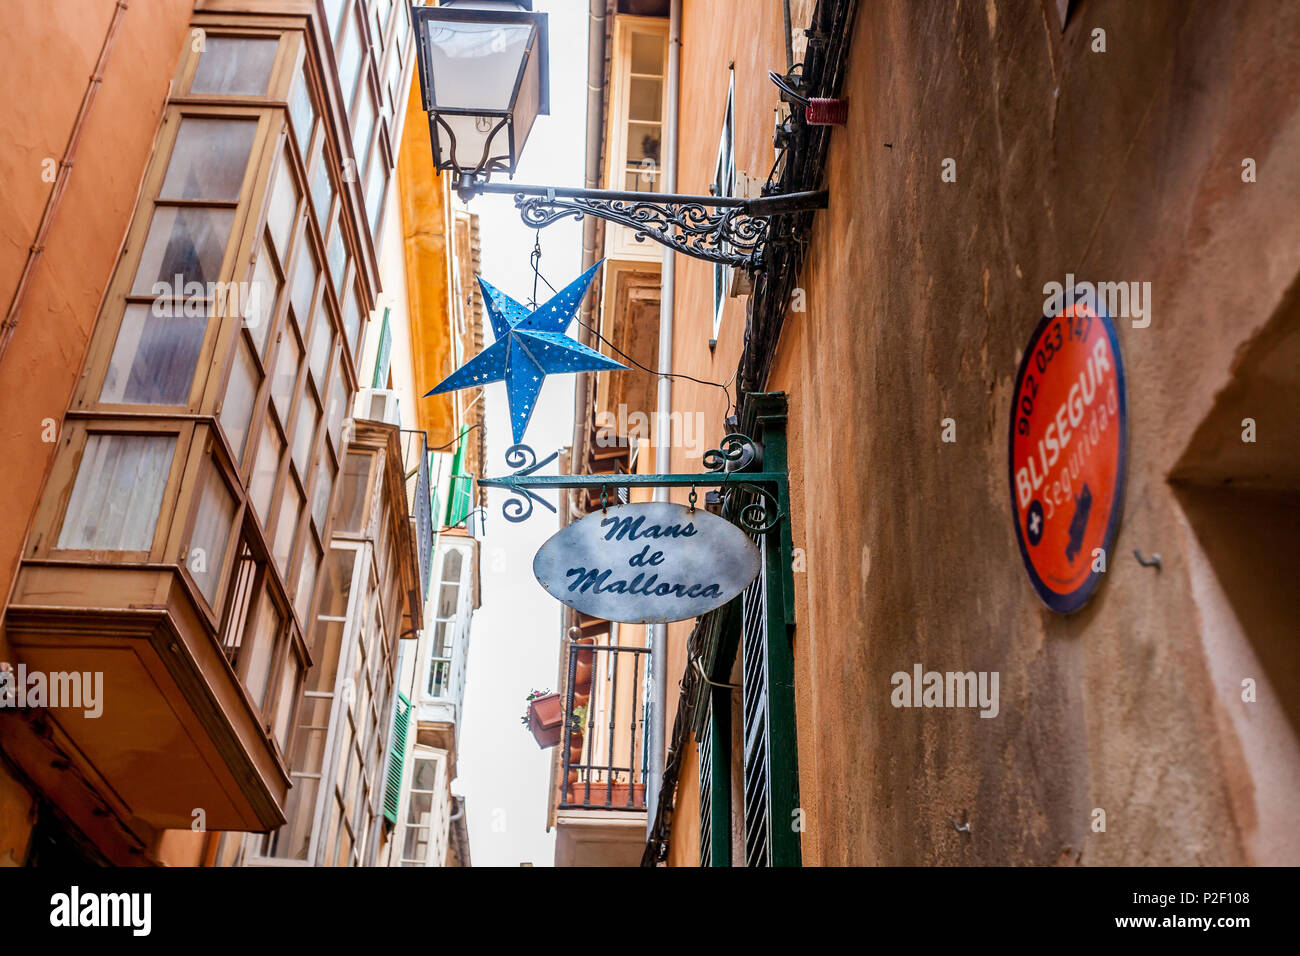 Christmas decoration, historic city centre, Ciutat Antiga, Palma de Mallorca, Majorca, Balearic Islands, Mediterranean Sea, Spai - Stock Image